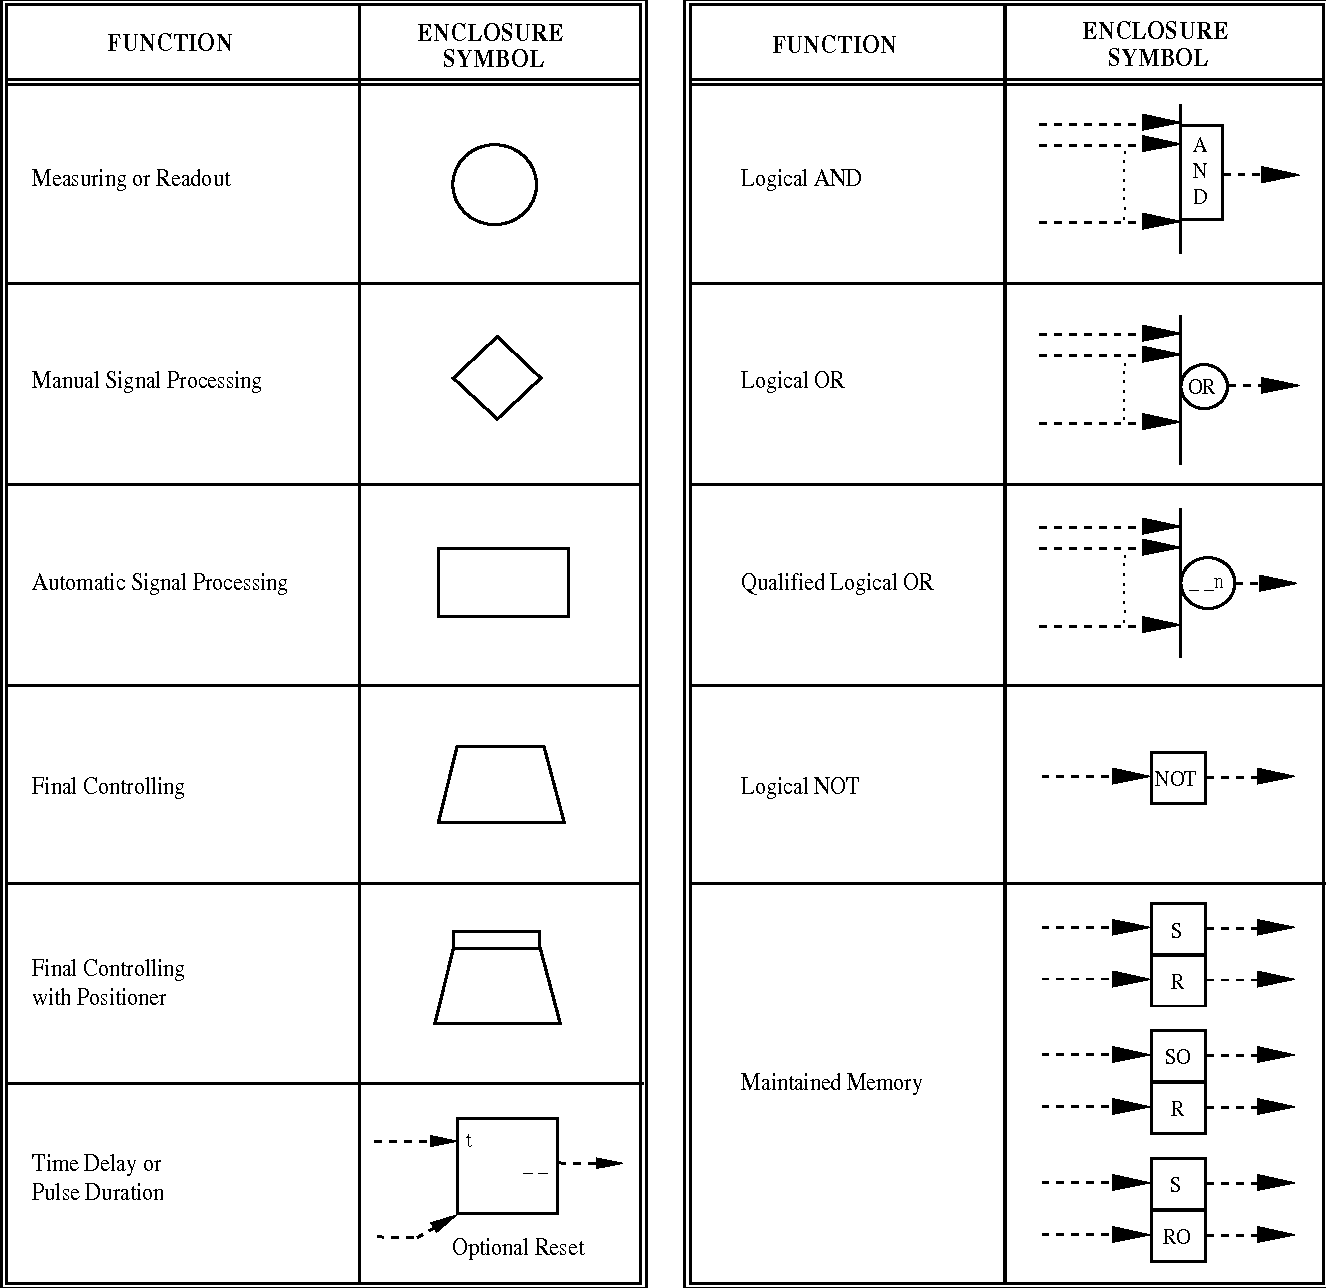 sama logic diagram wiring diagrams search Logic Diagram Symbol Key